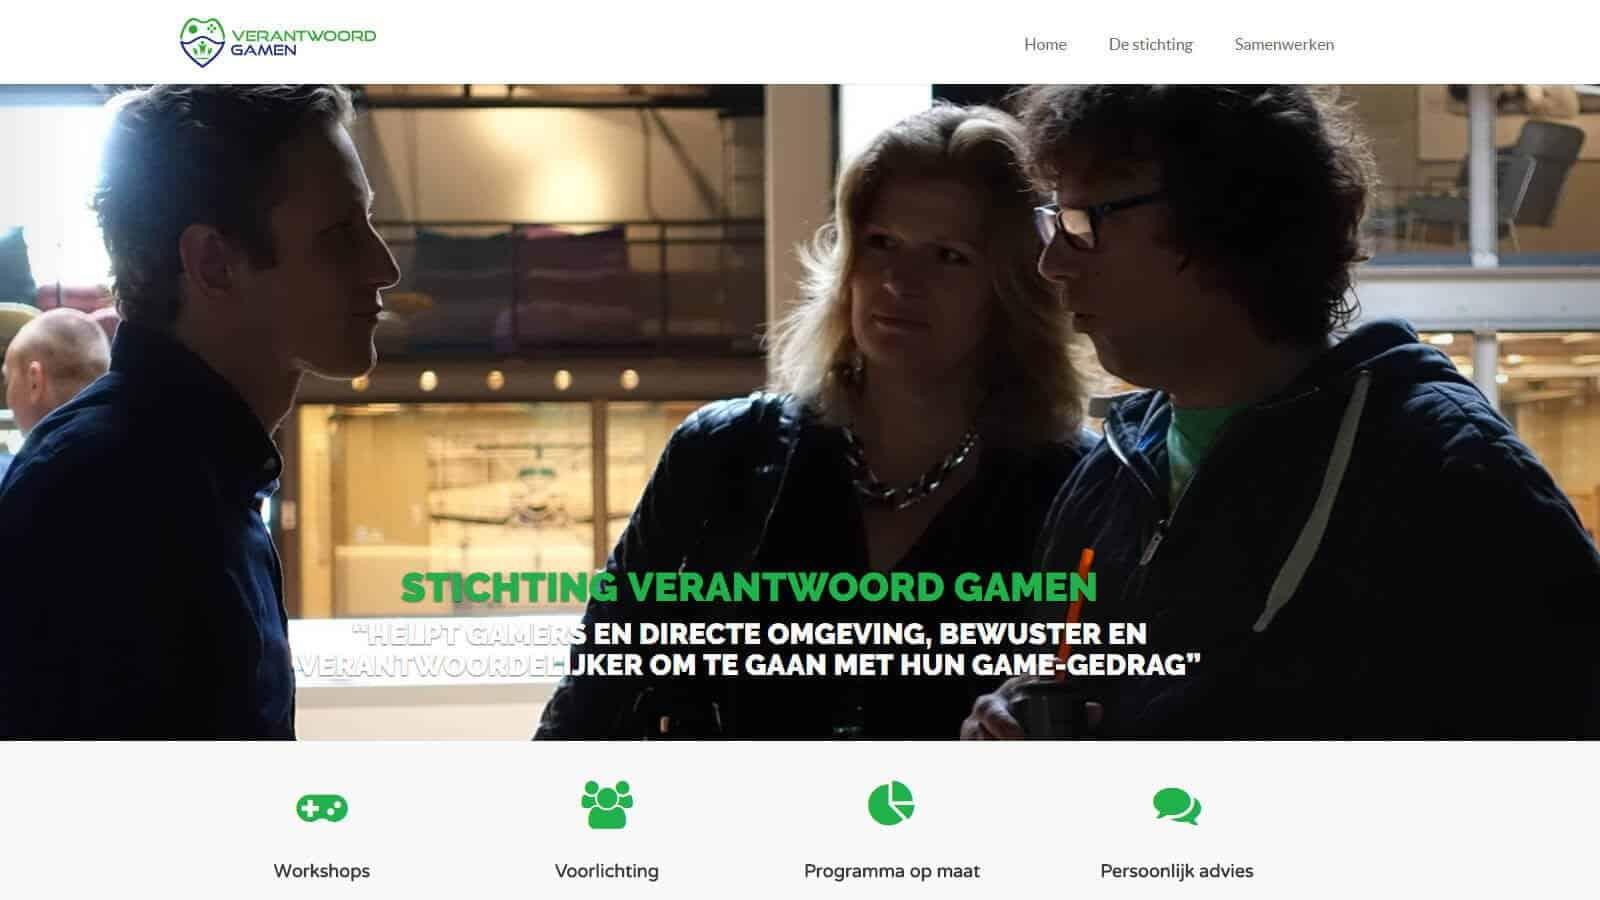 verantwoord gamen website  - verantwoord gamen - Websites